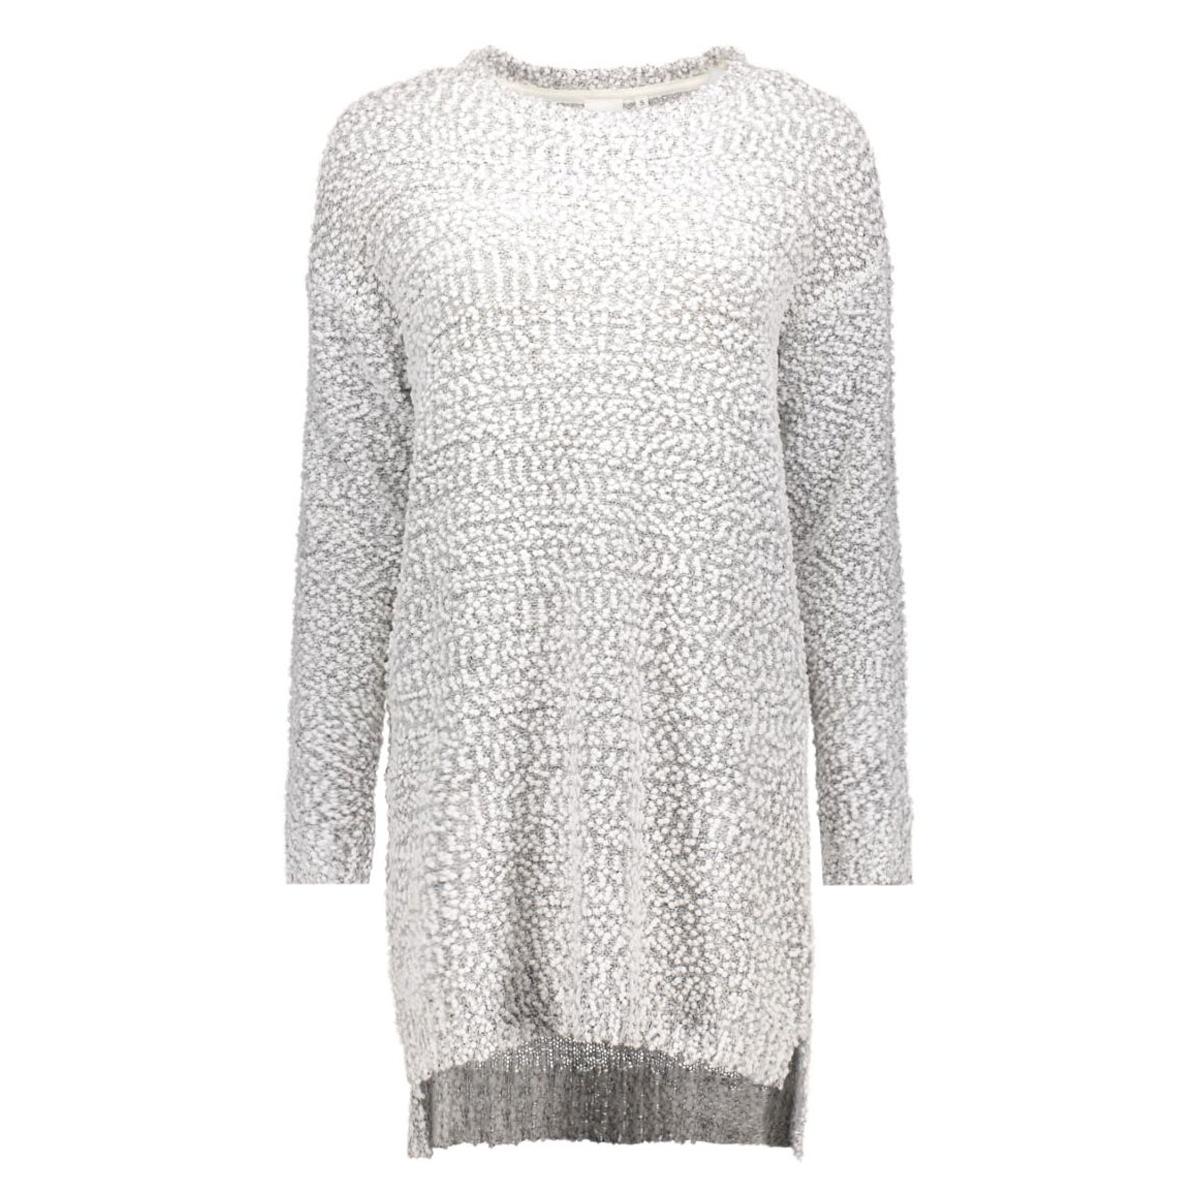 objsofial l/s knit dress 23023166 object jurk gardenia